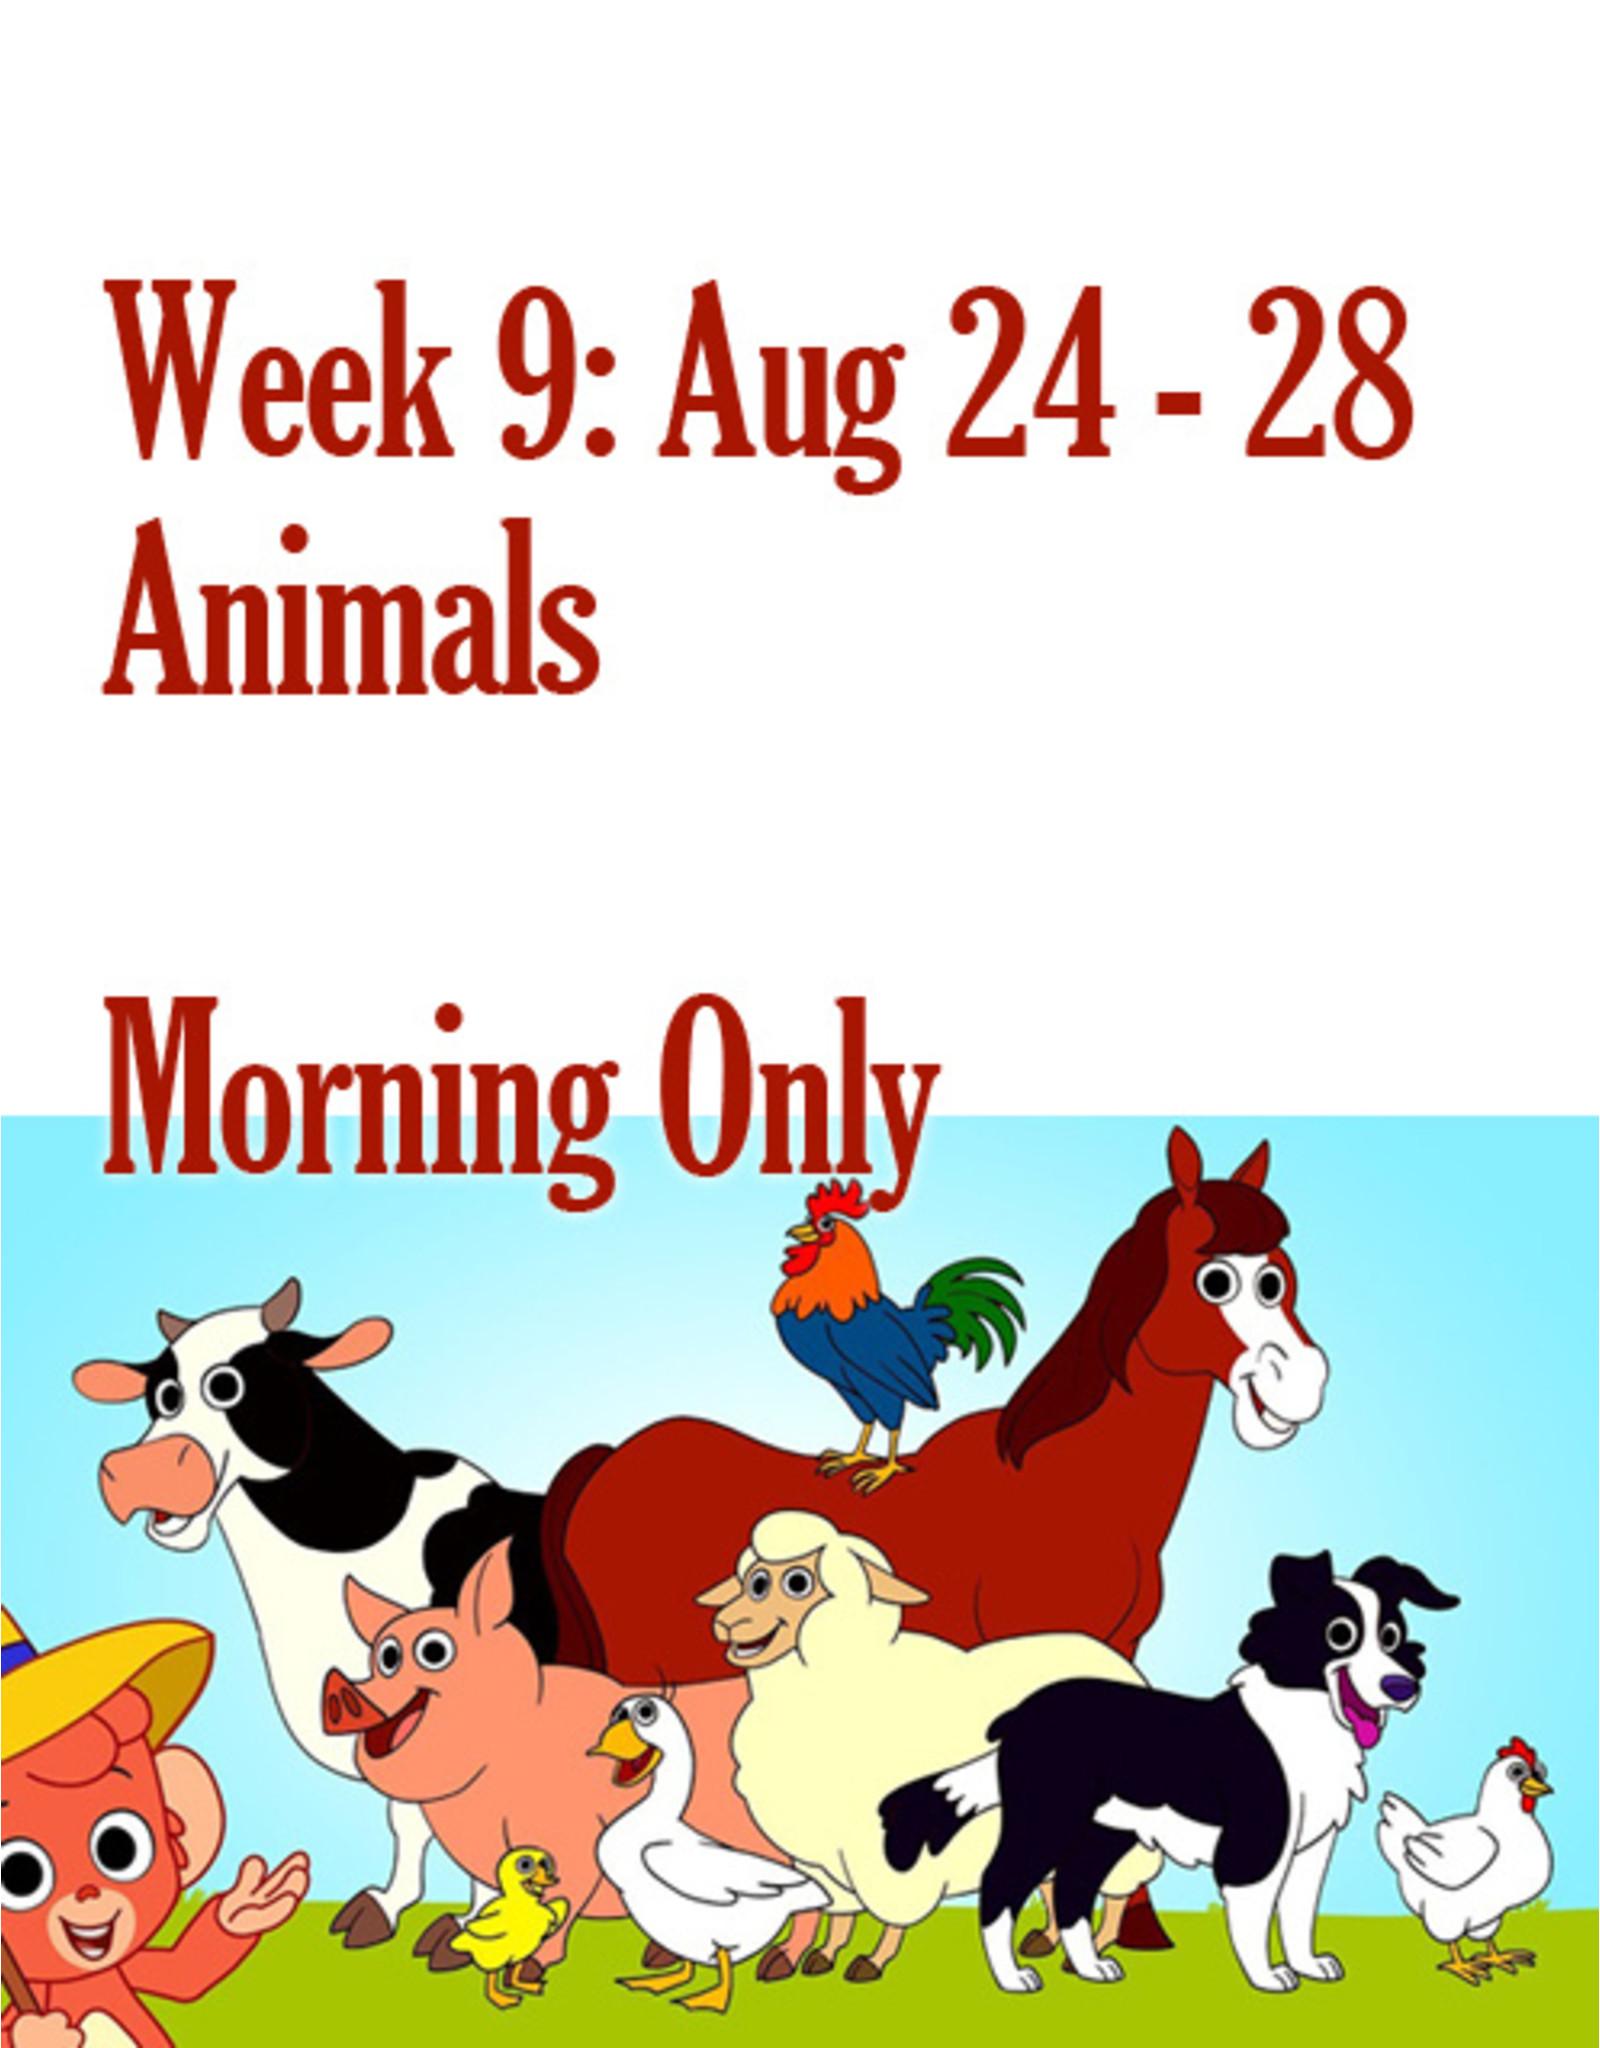 Art Camp Art Camp: Week Nine August 24 - Aug 28 Morning